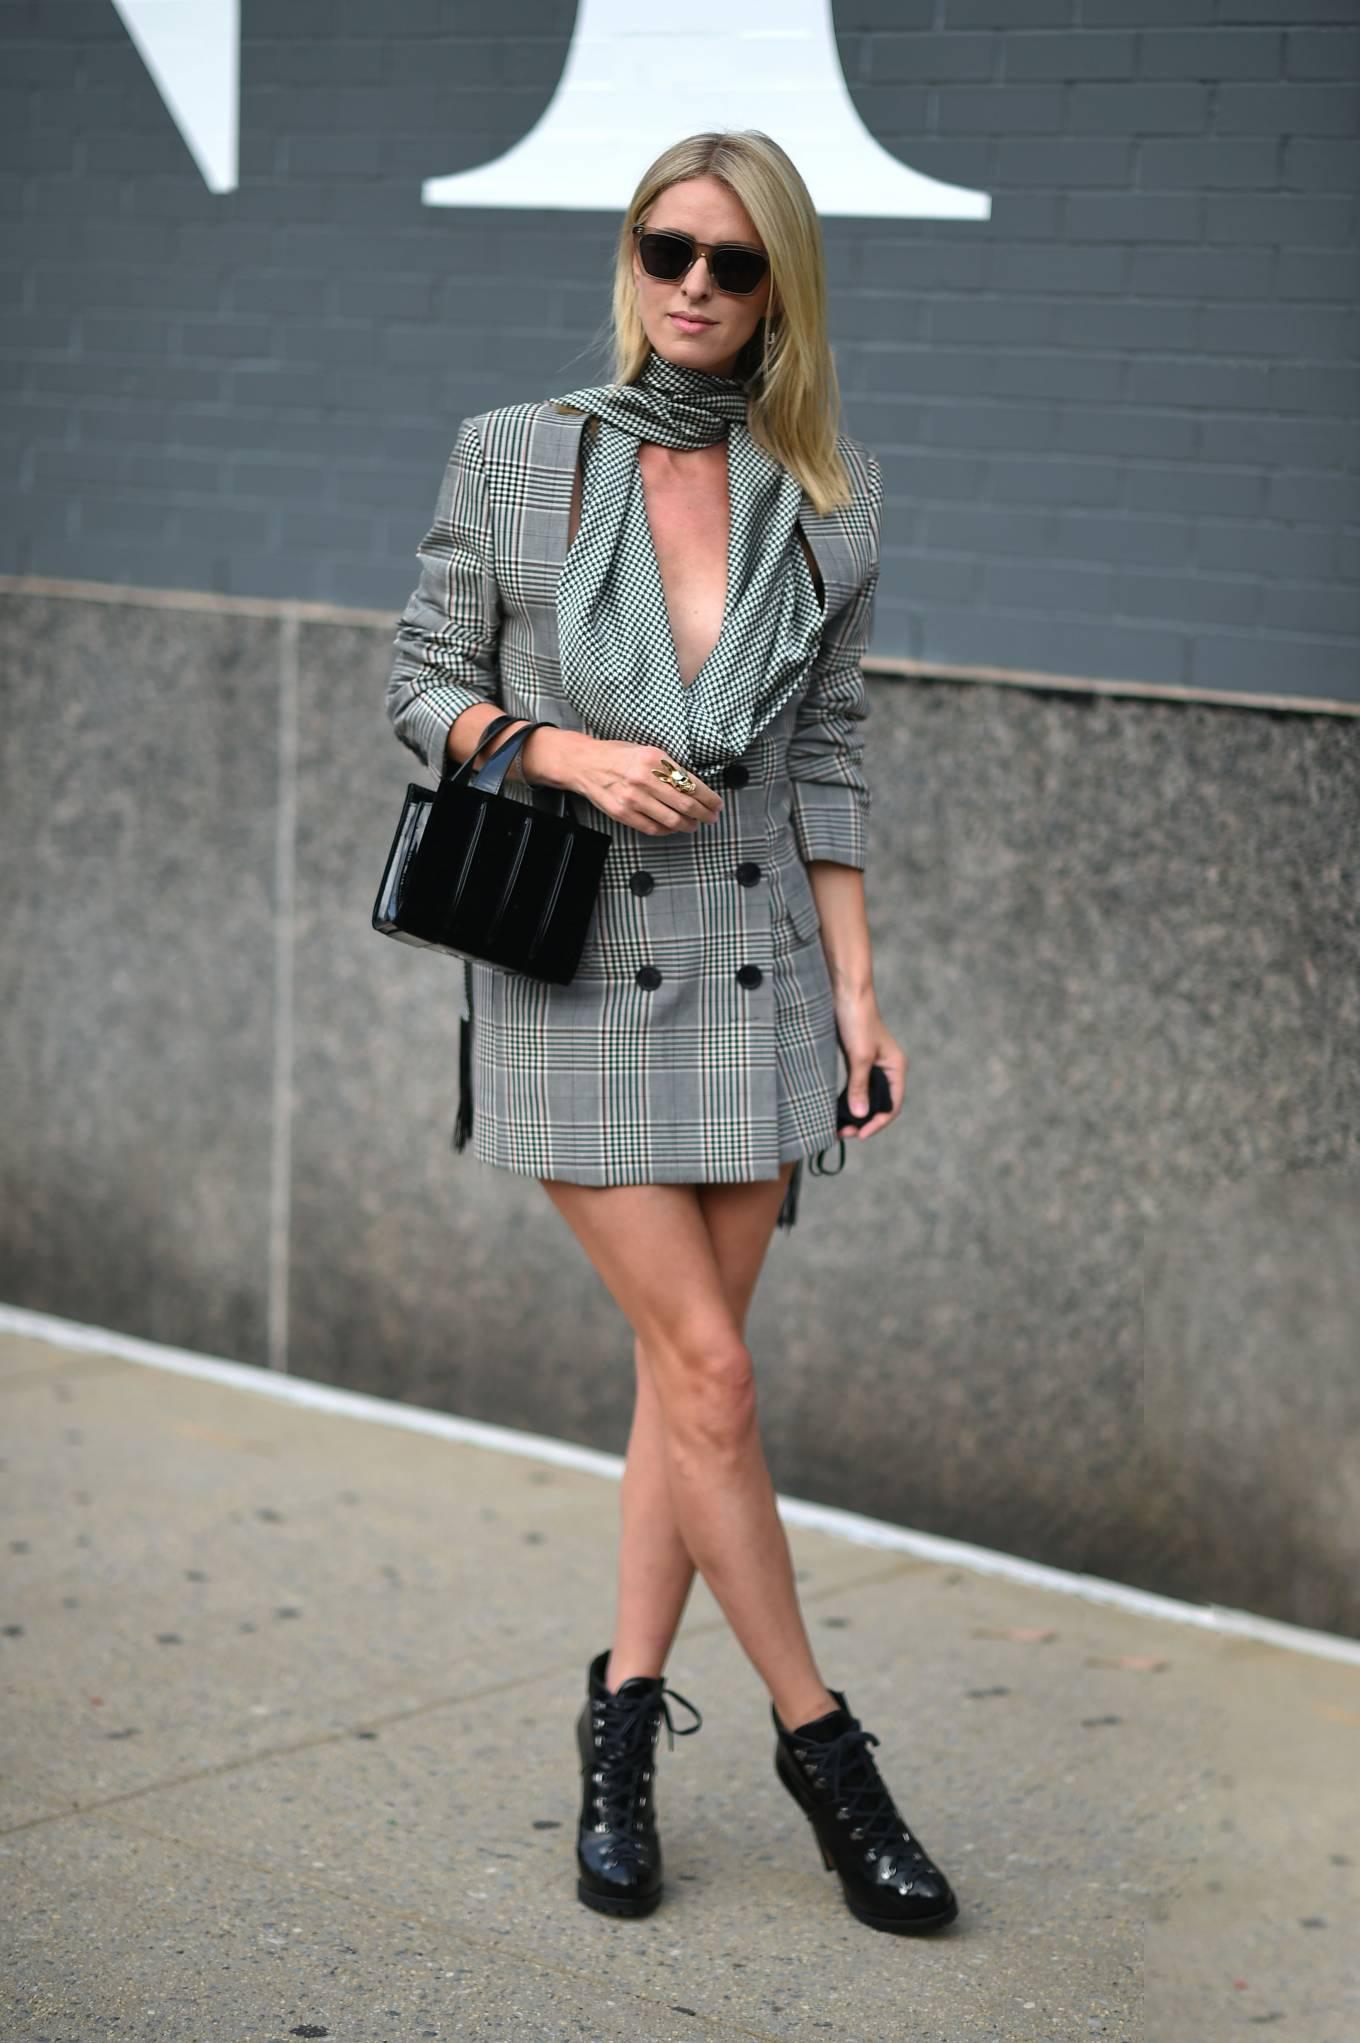 Nicky Hilton 2020 : Nicky Hilton – New York Fashion Week – Monse Fall-Winter 2020 Presentation-29